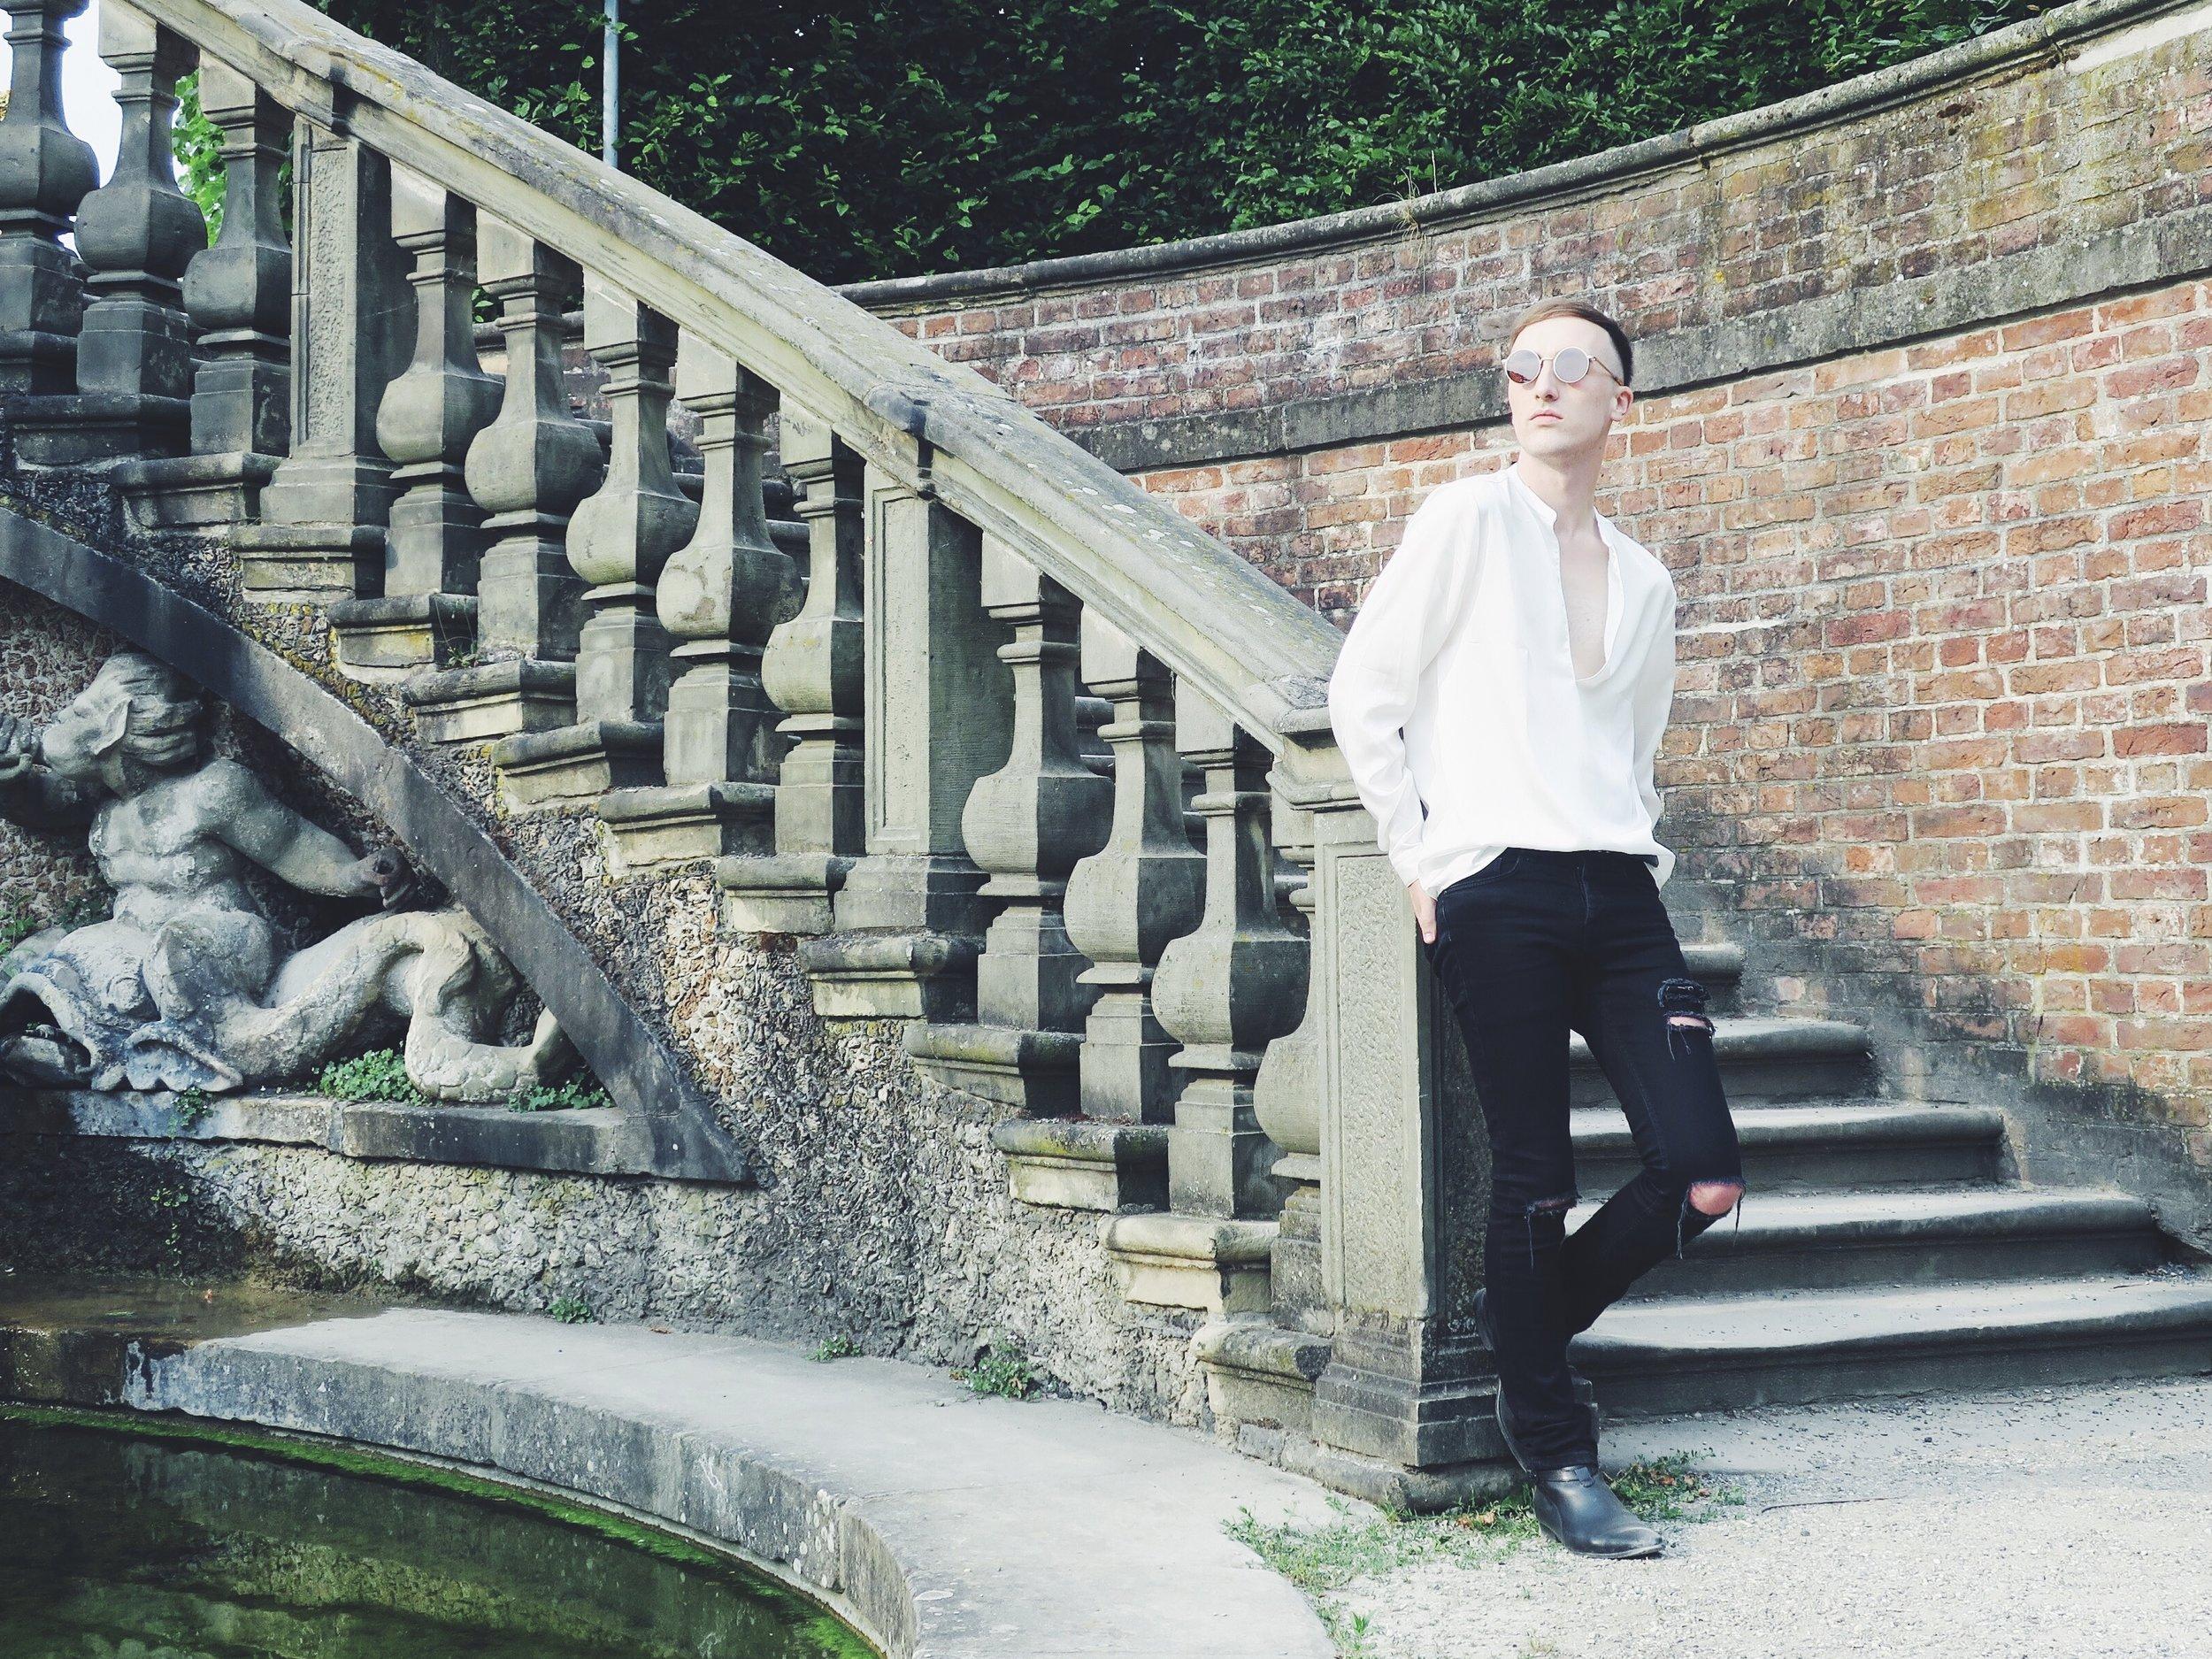 Asos shirt - Asos jeans - Sacha ankle boots - Komono sunglasses